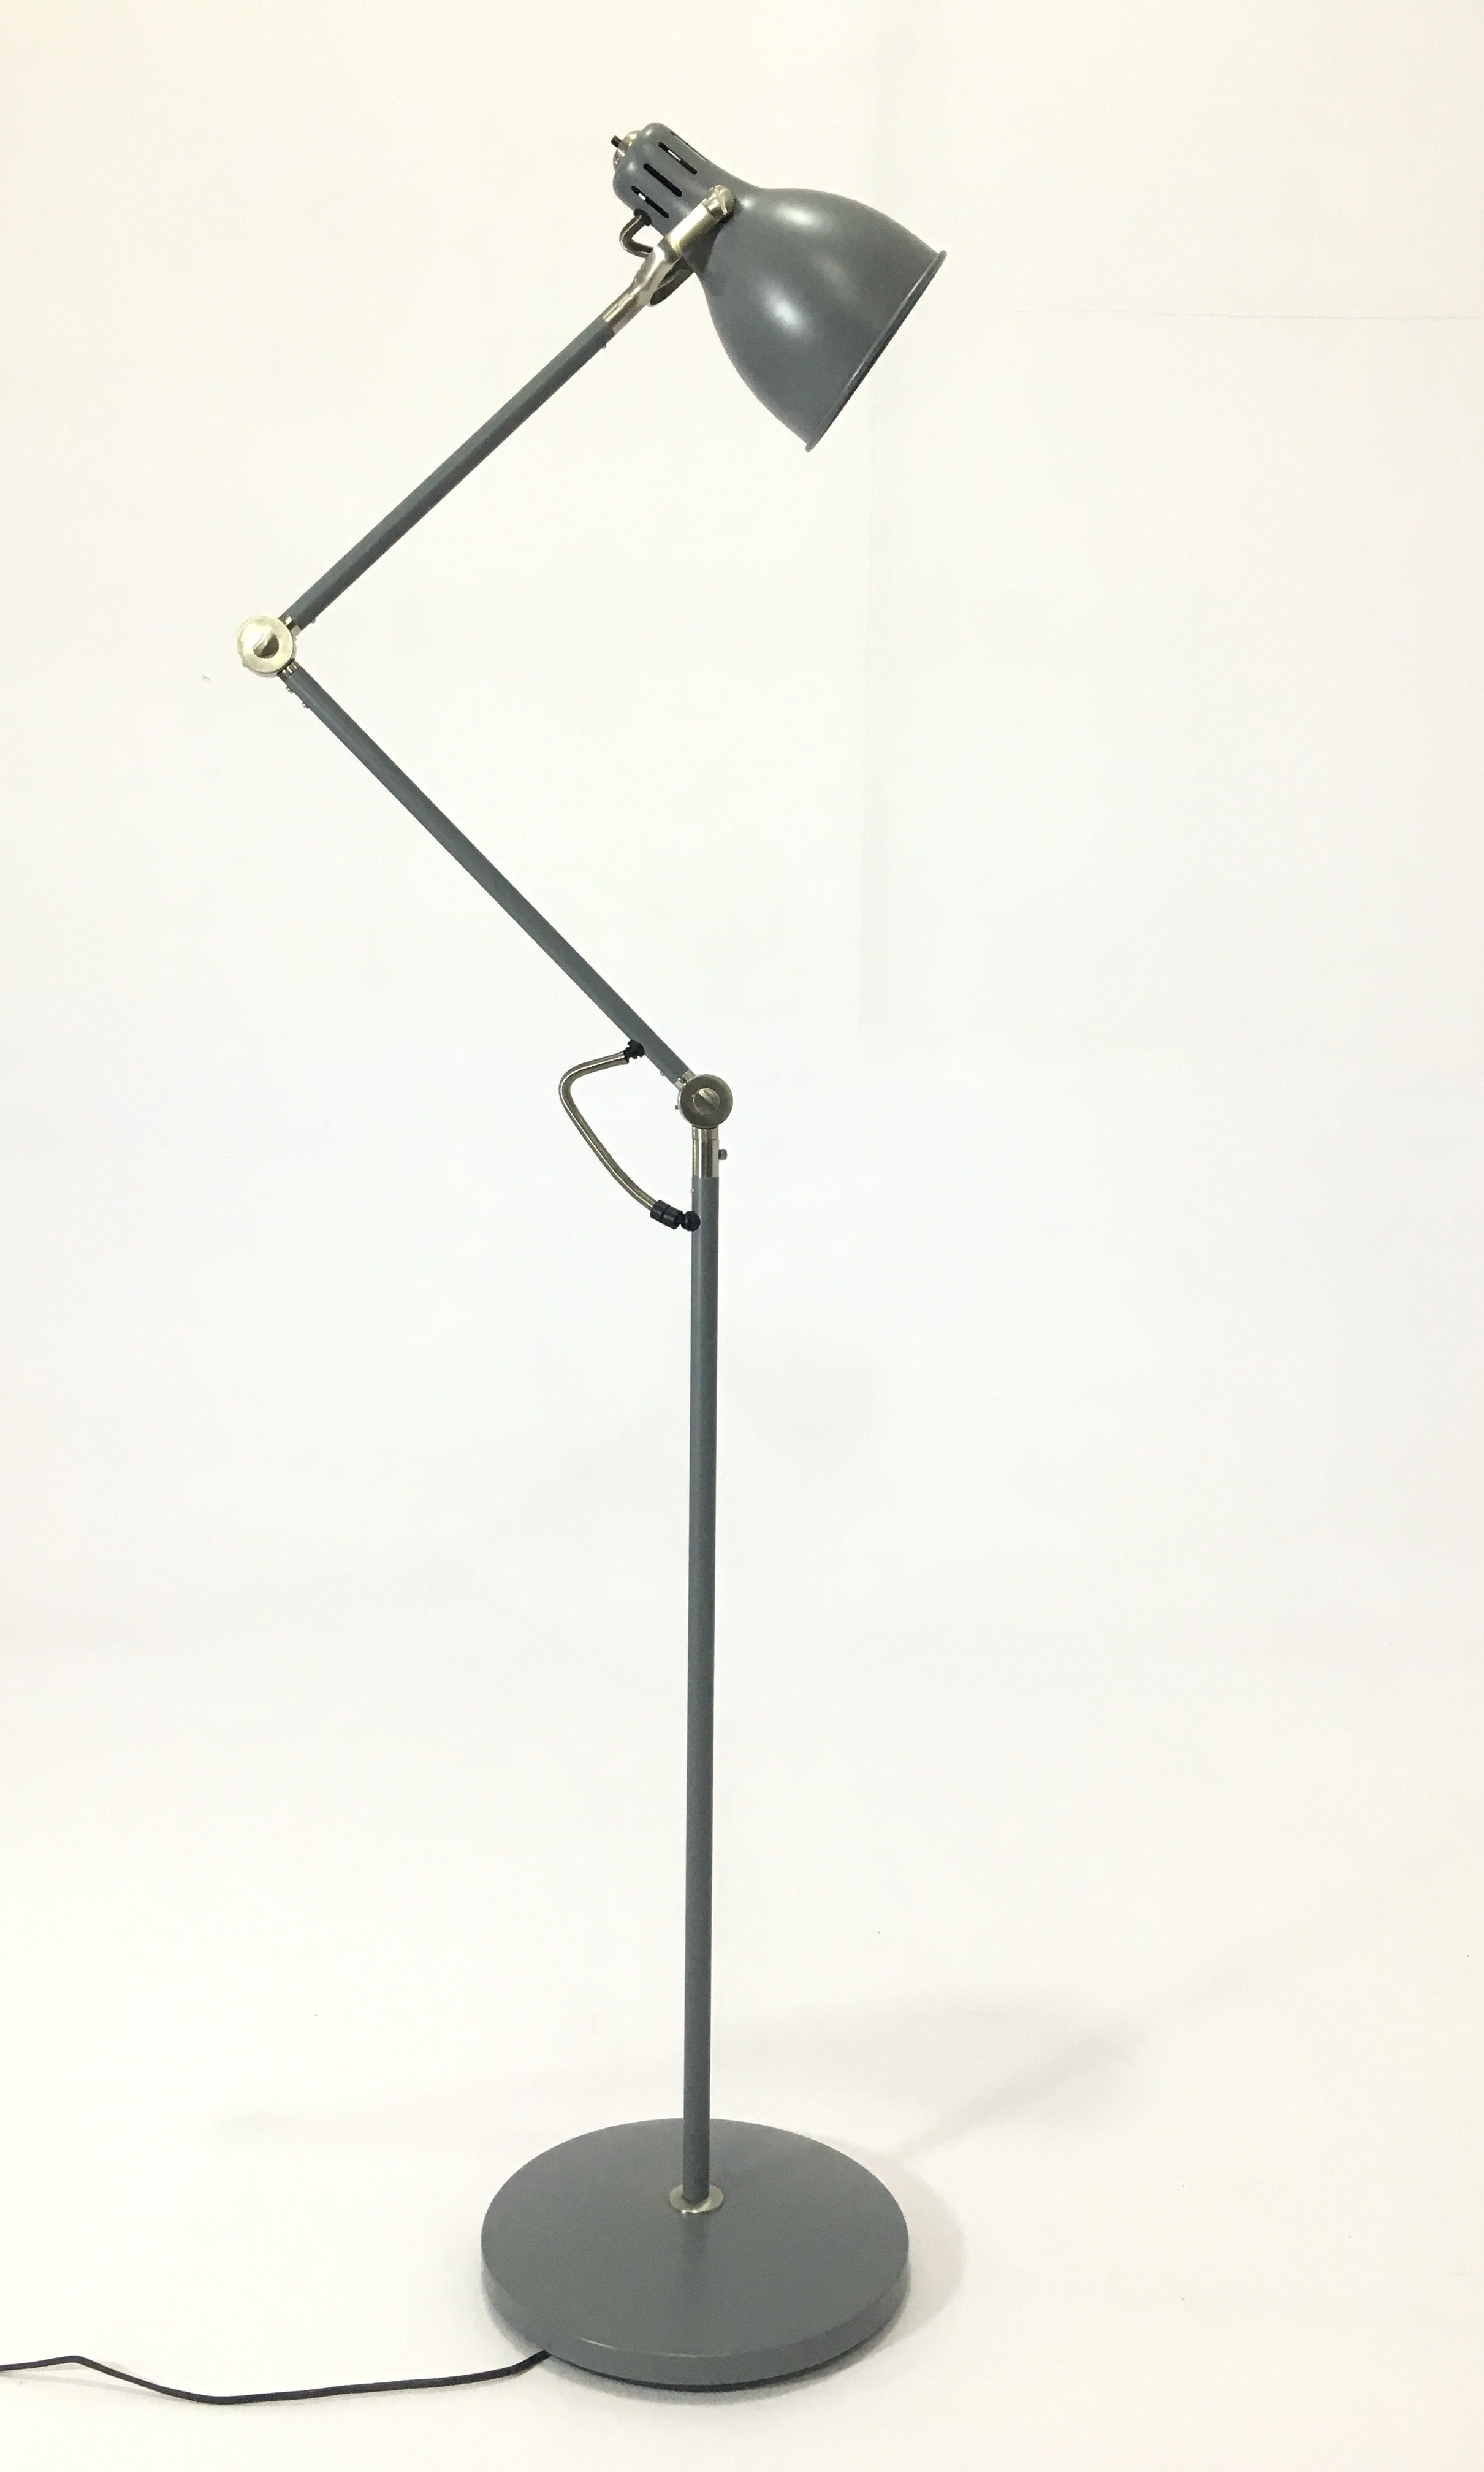 Py 5275 Floor Lamp Rod Iron Black 3 Fold Metal Small Lamp 50 To 64 Lamp Small Lamp Floor Lamp